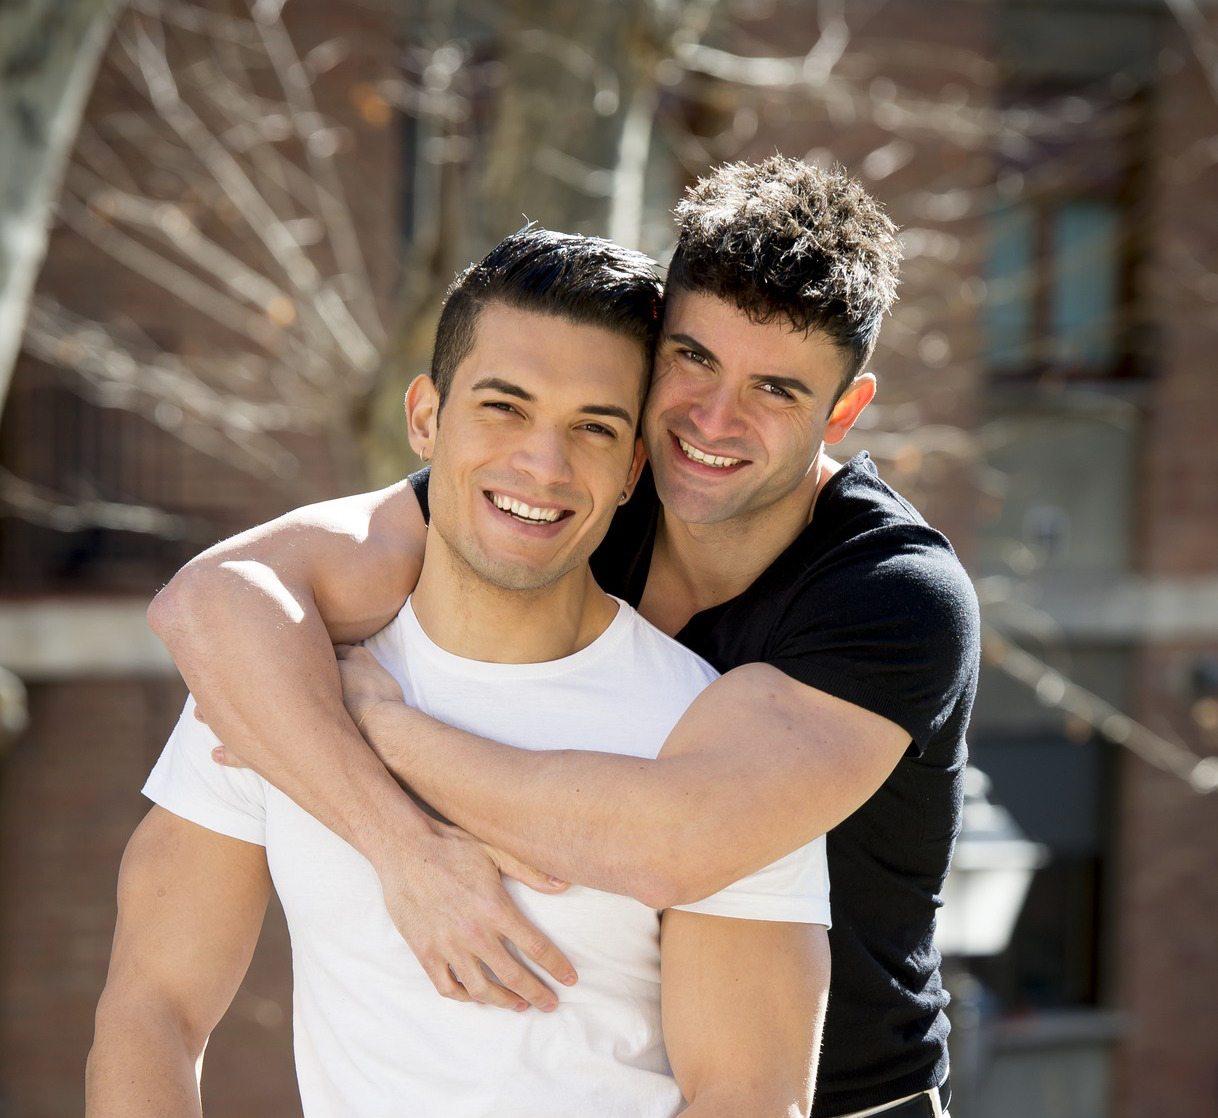 photodune-10417153-young-happy-gay-men-couple-cuddling-on-street-free-homosexual-love-concept-m.jpg